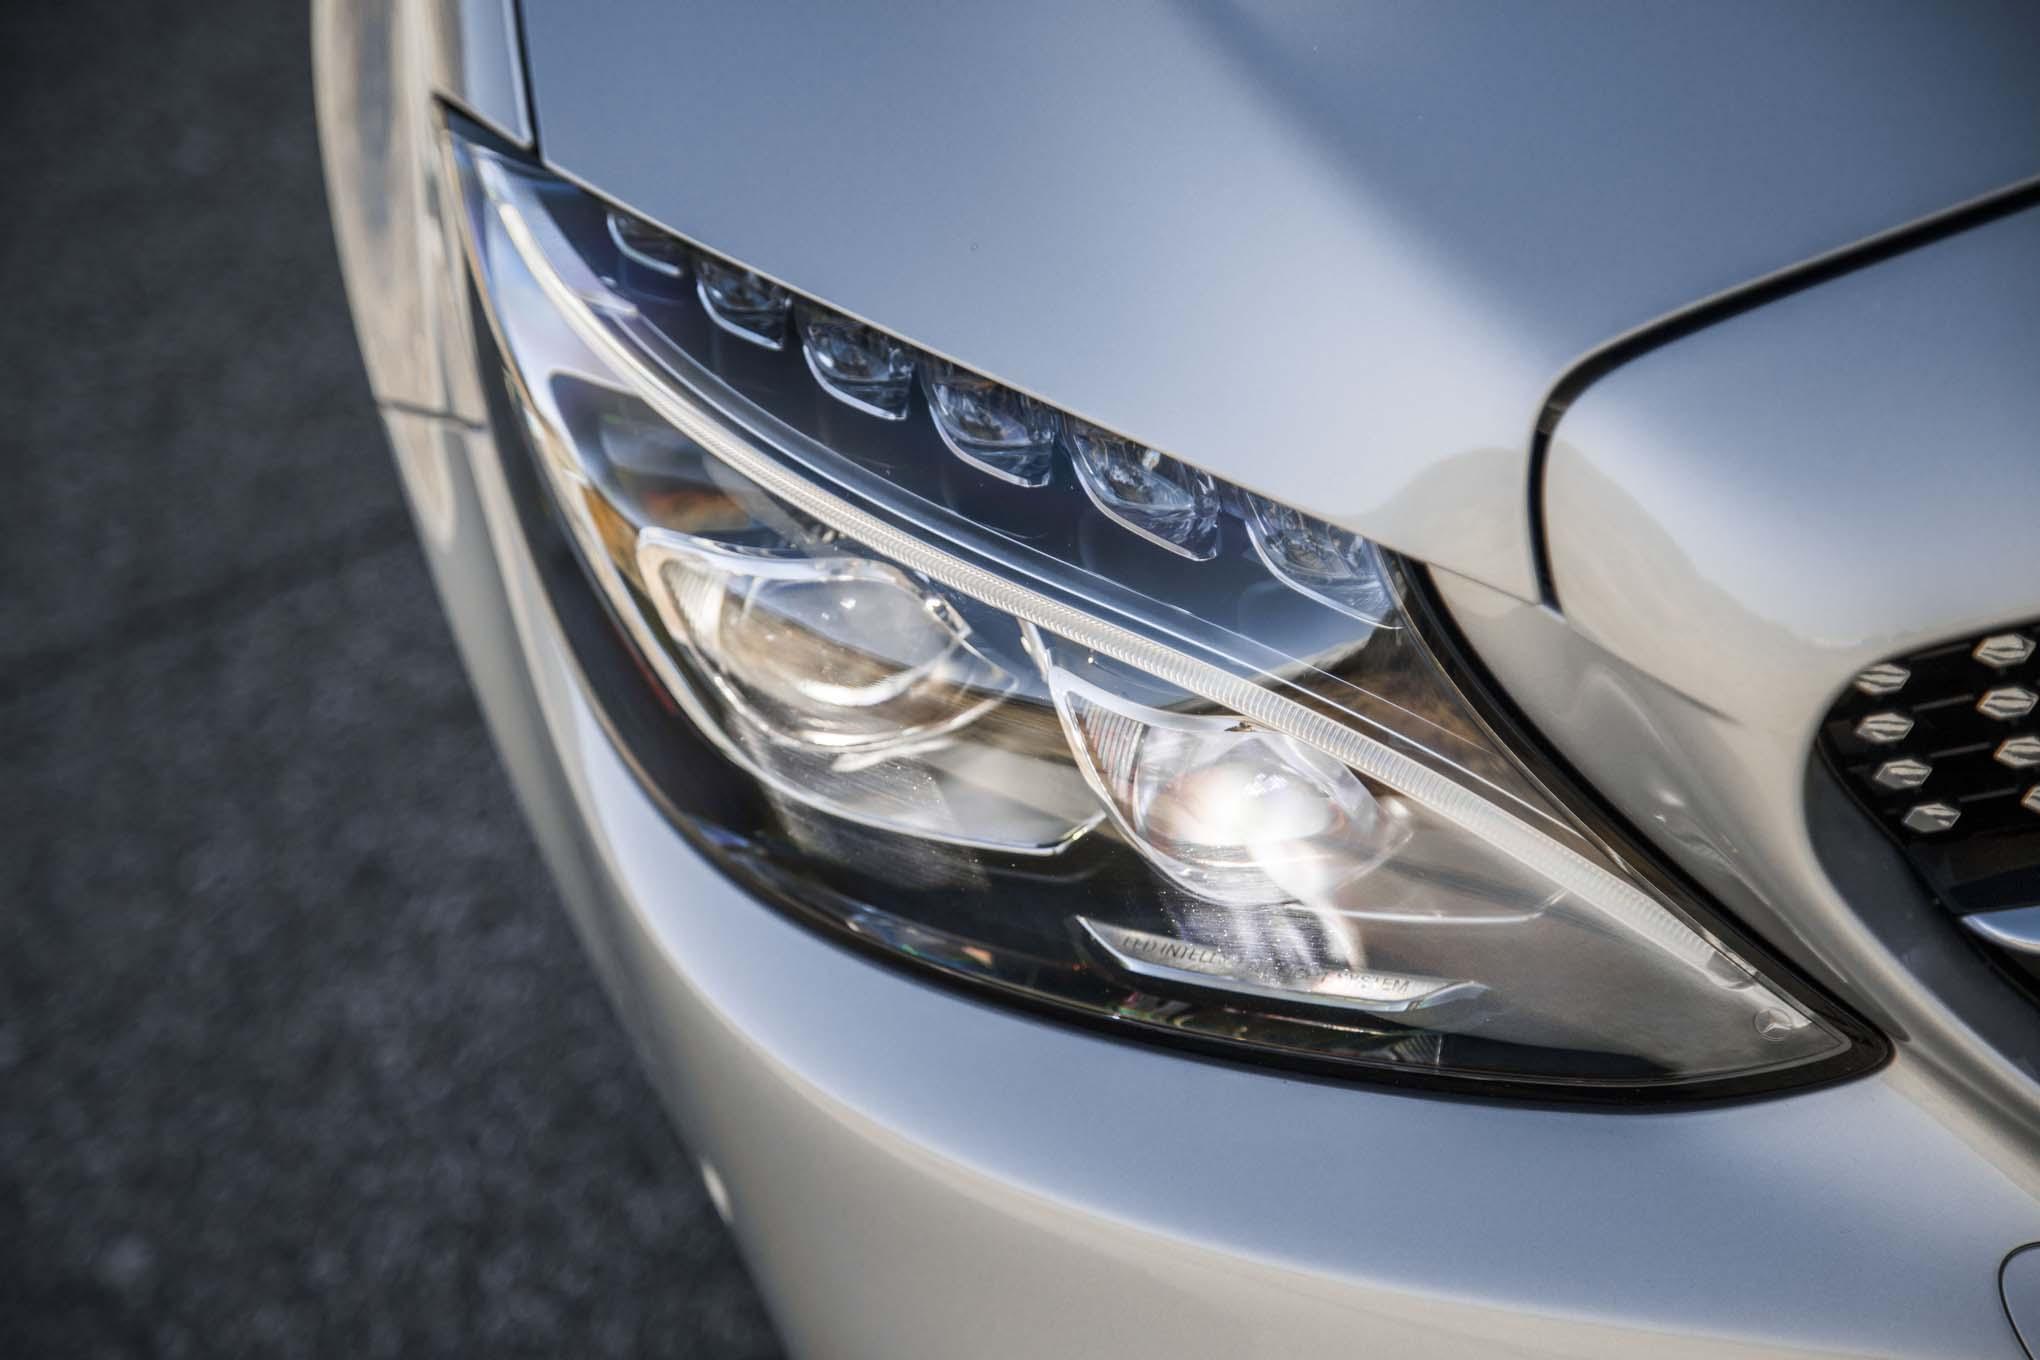 2017 Mercedes AMG C43 Coupe Headlight